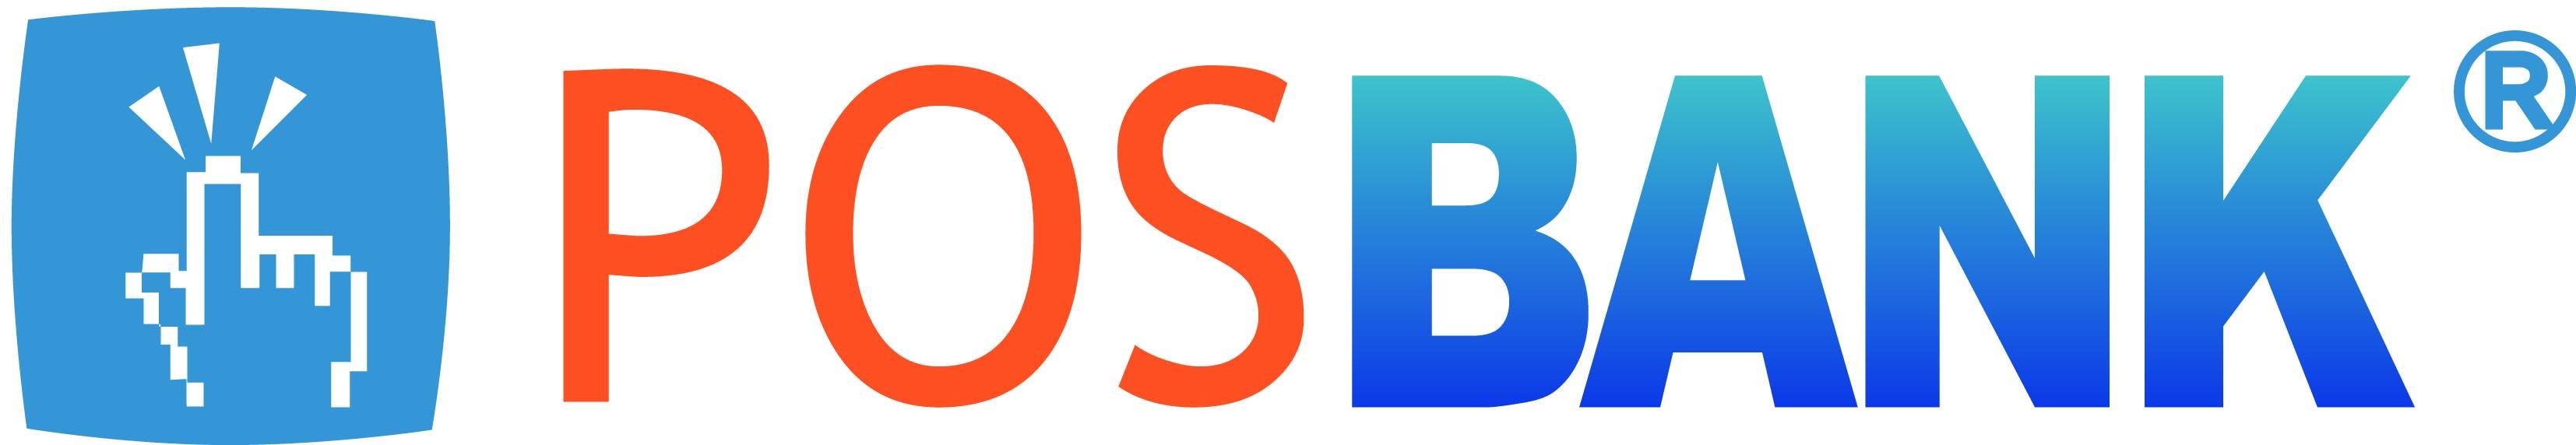 posbank-logo-1-.jpg